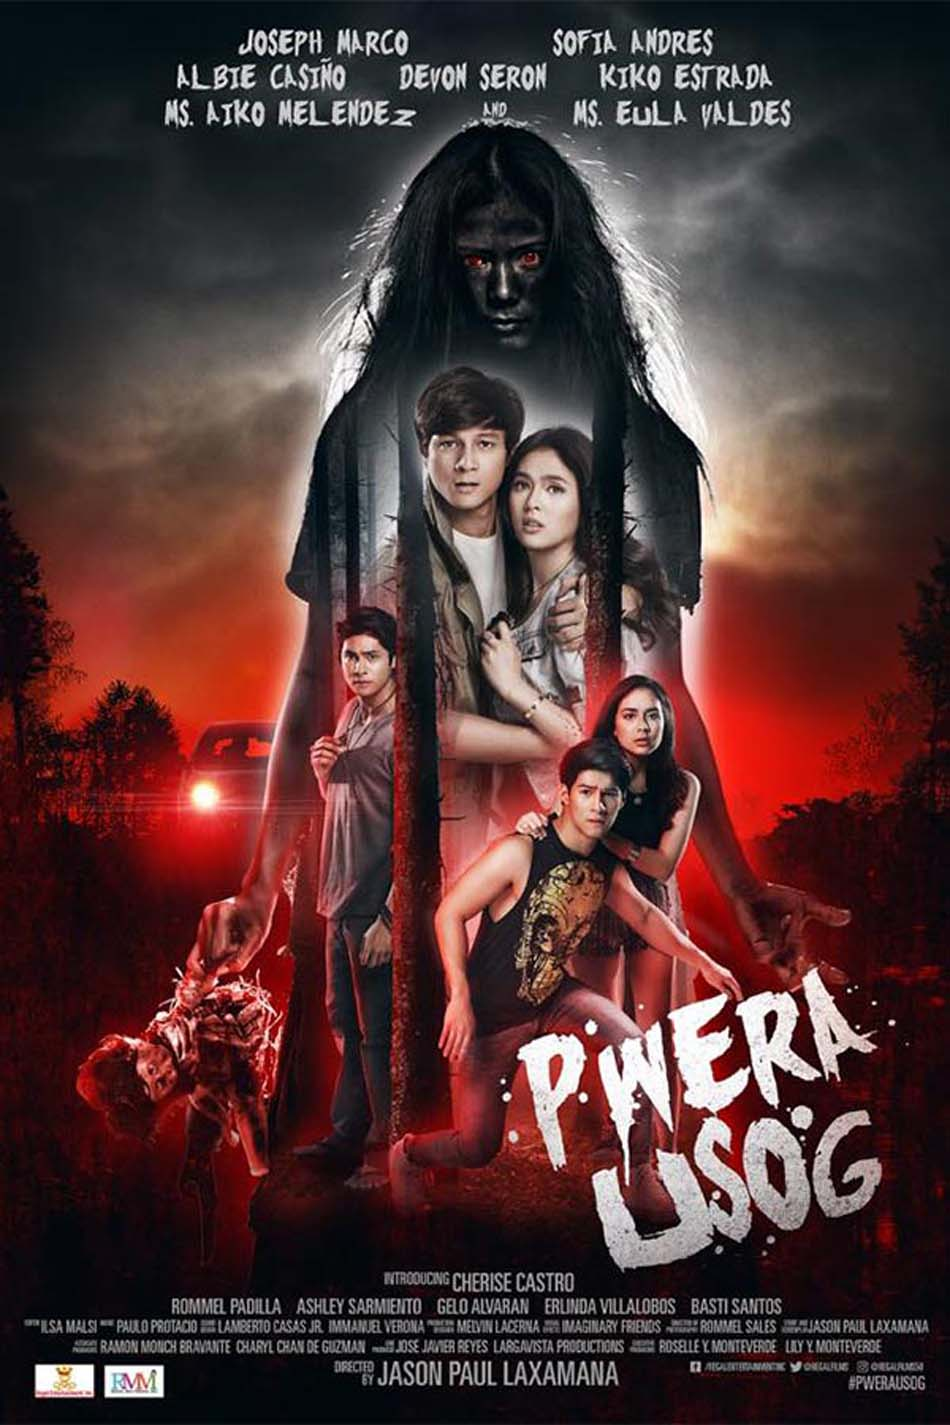 NIFFF 2017 : Pwera usog - Daily Movies